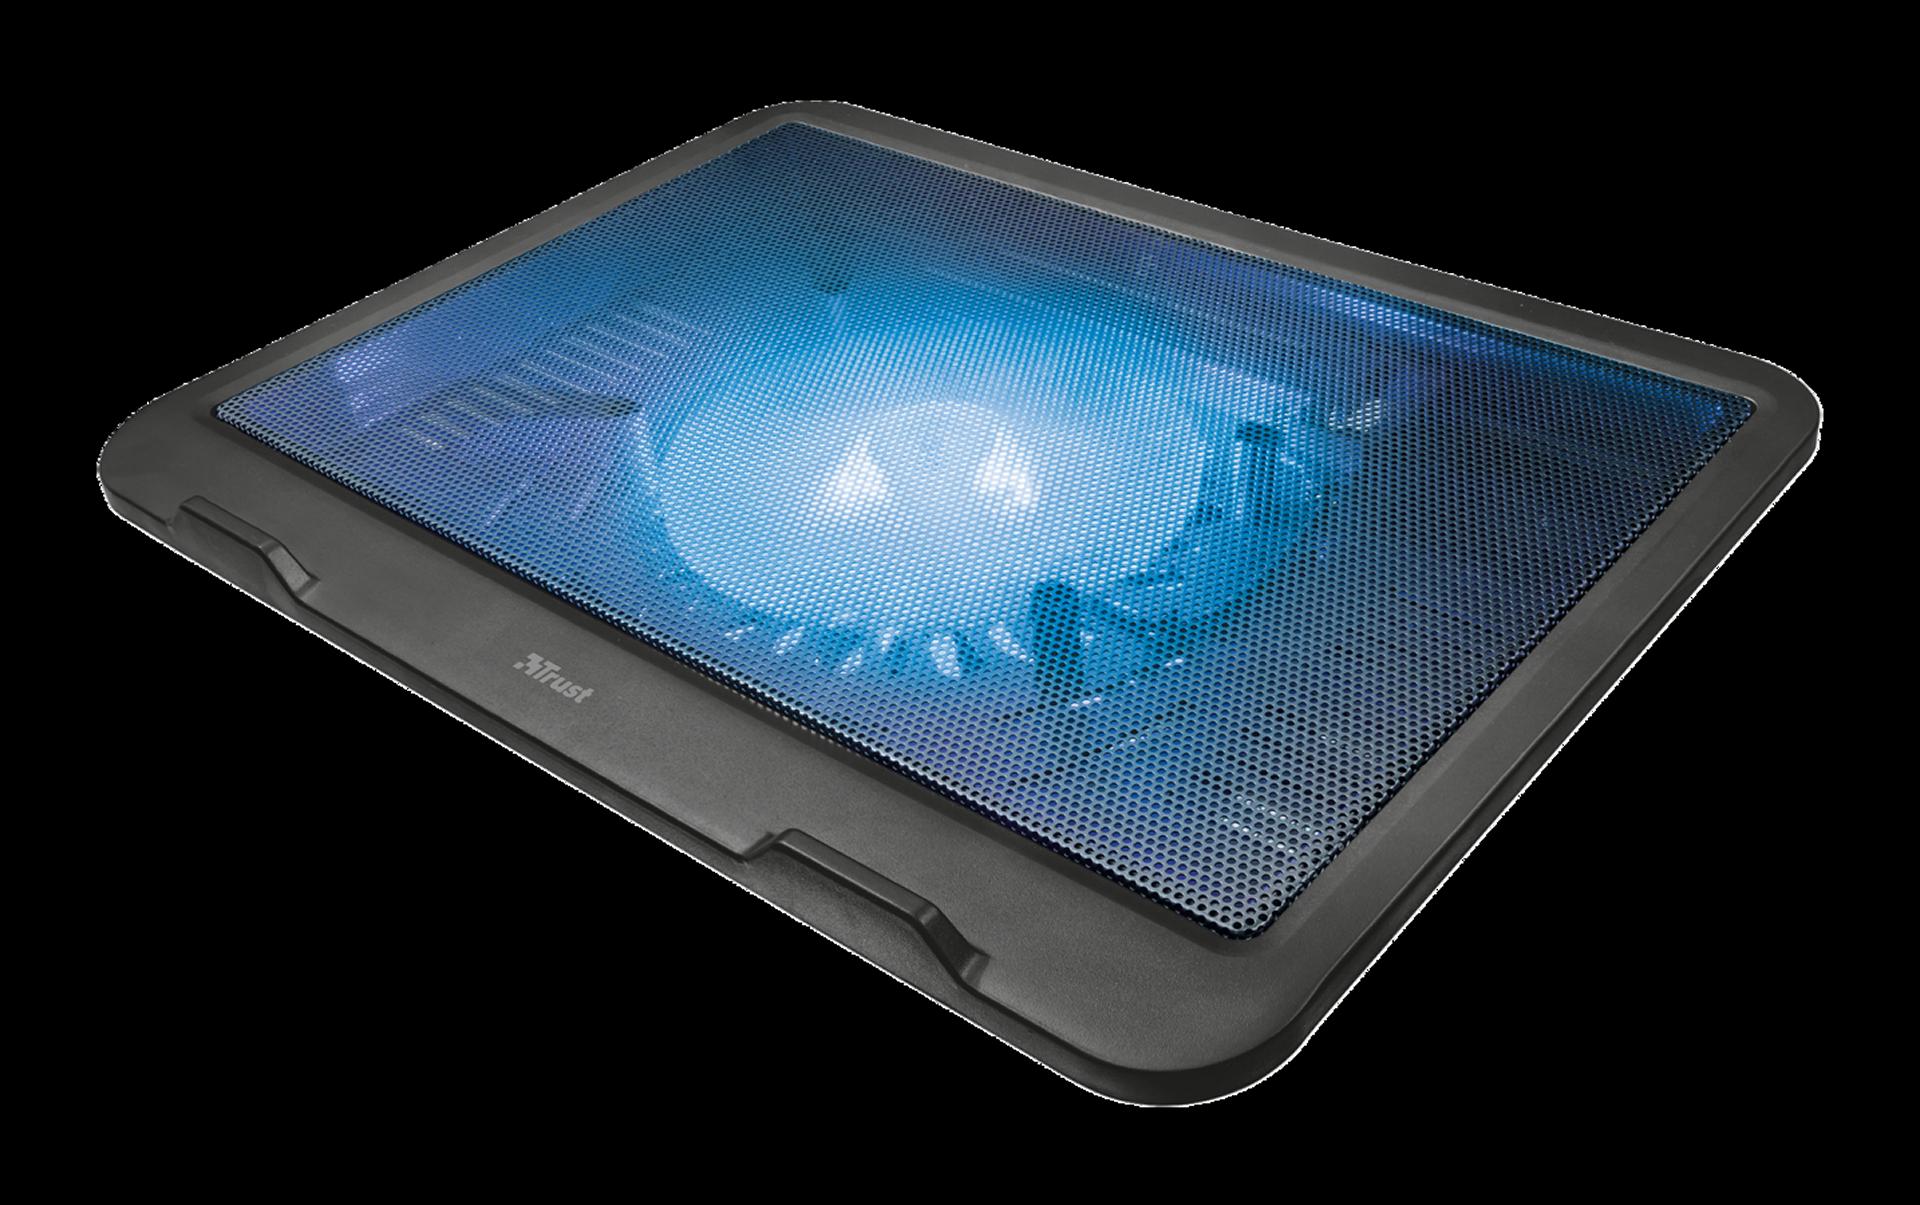 stojan TRUST Ziva Laptop Cooling Stand - 21962